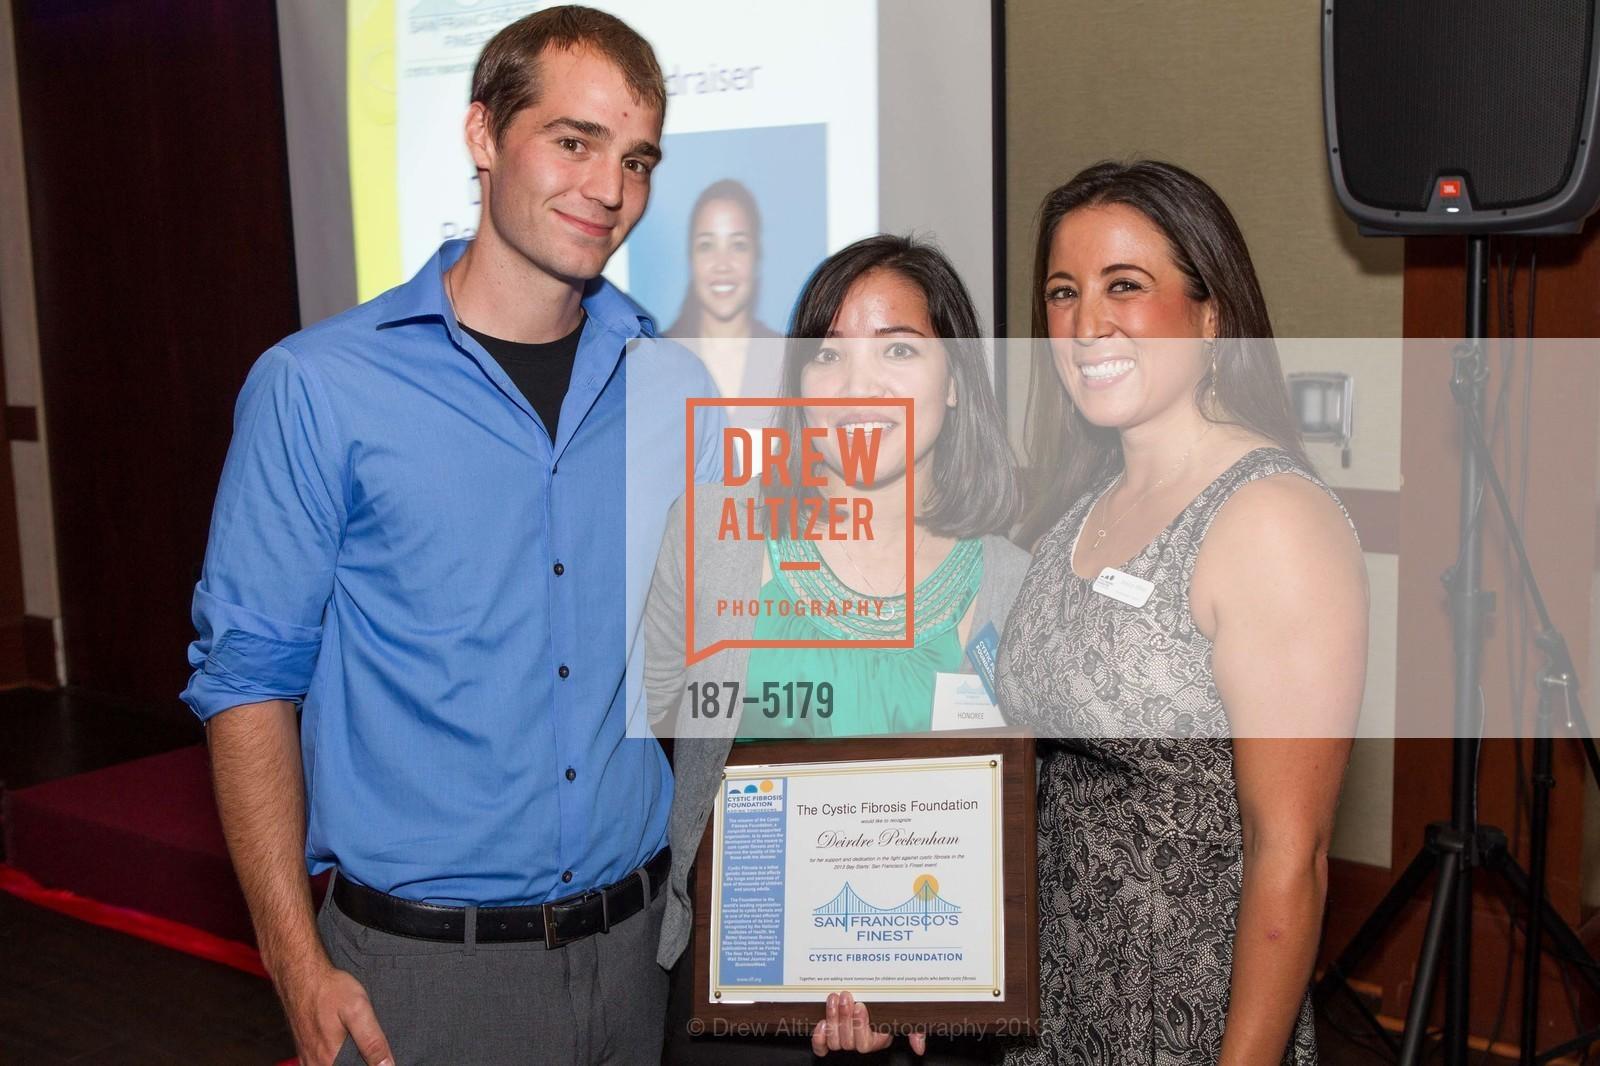 Justin Shields, Deirdre Peckingham, Jessica Albee, Photo #187-5179